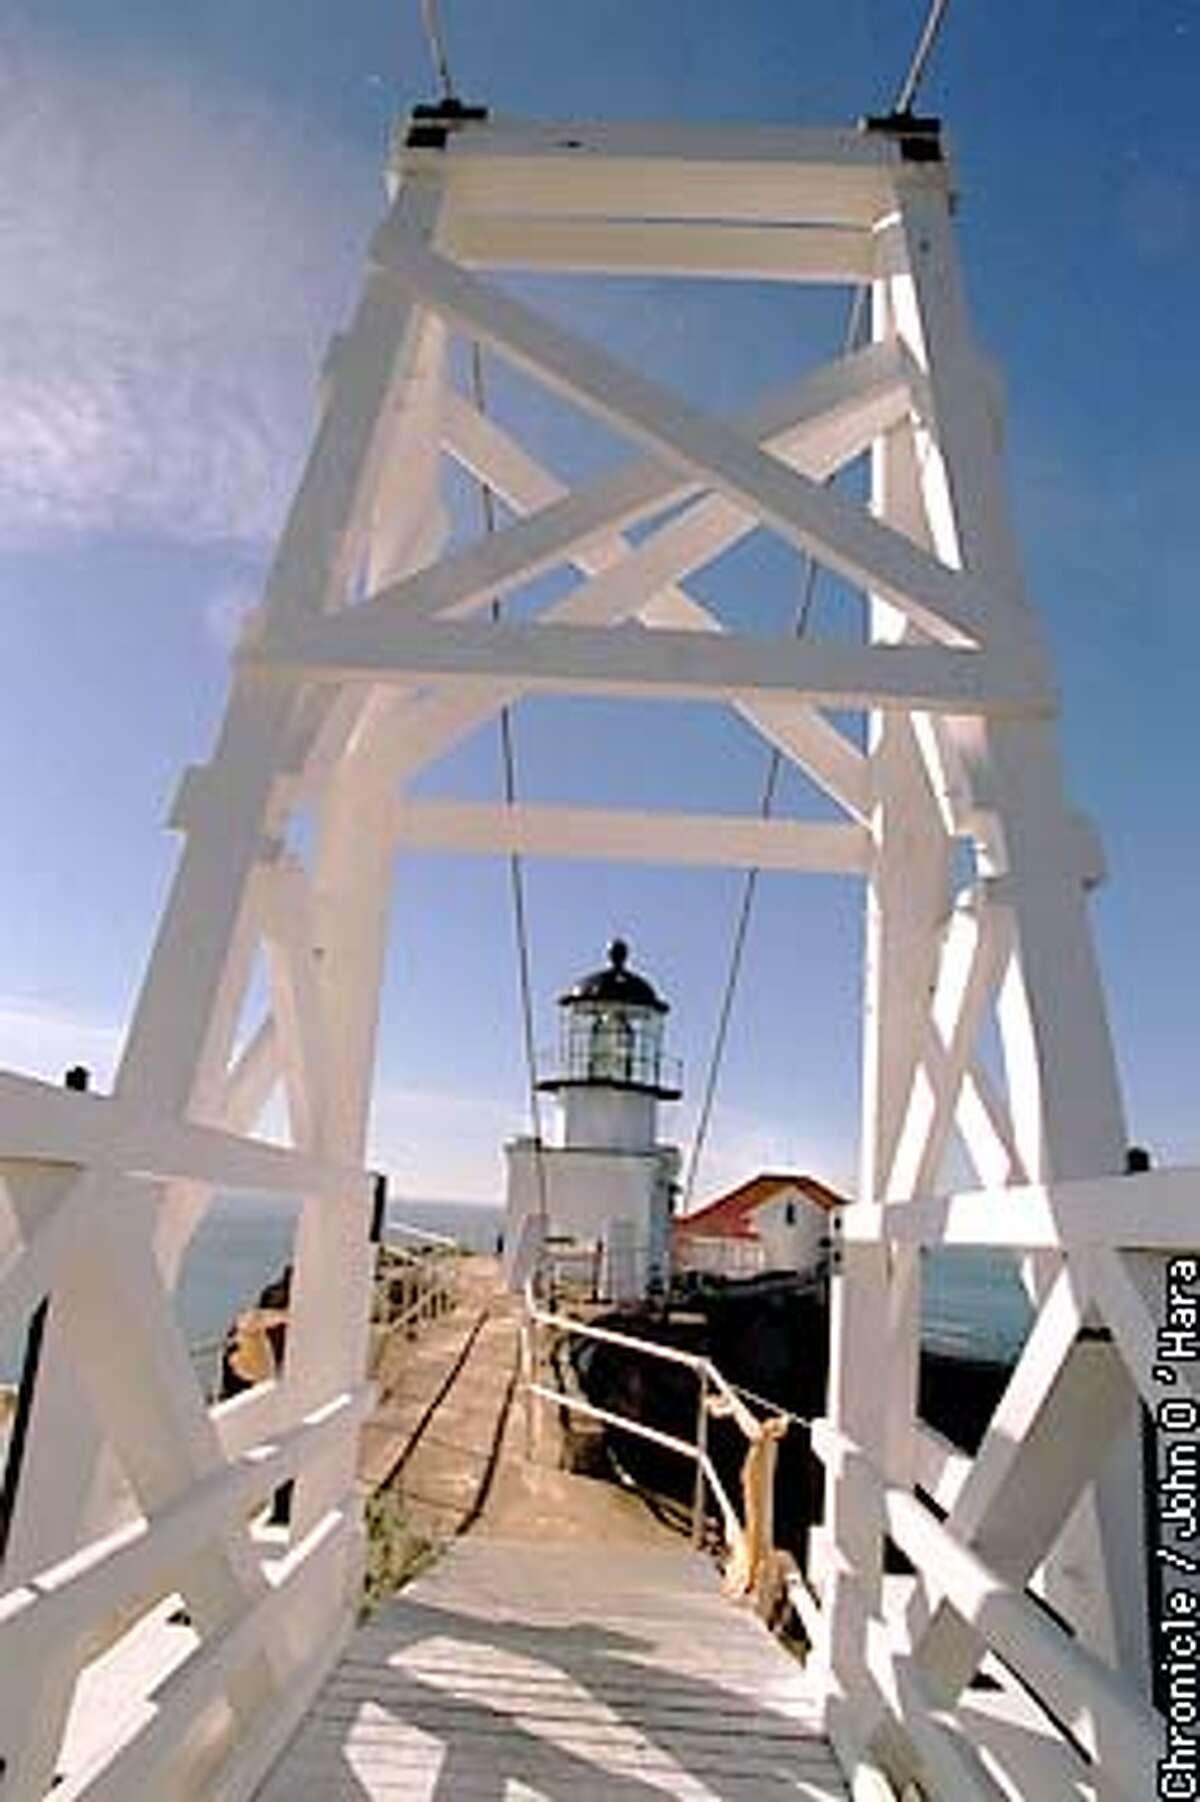 LIGHTHOUSE#3/C/29NOV95/CD/JO'H Point Bonita Light house,view from suspencion bridge. Photo by...........John O'Hara